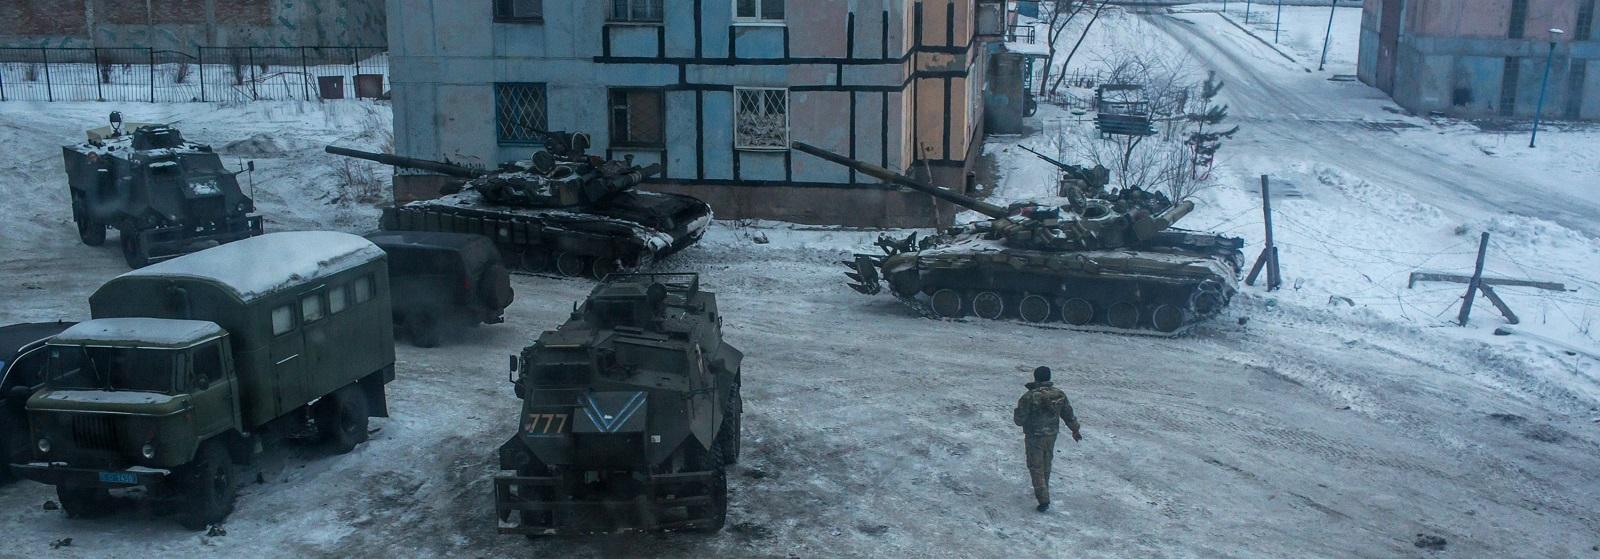 A Ukrainian soldier and tanks on 2 February, 2017 in Avdiivka, Ukraine (Photo: Brendan Hoffman/Getty)